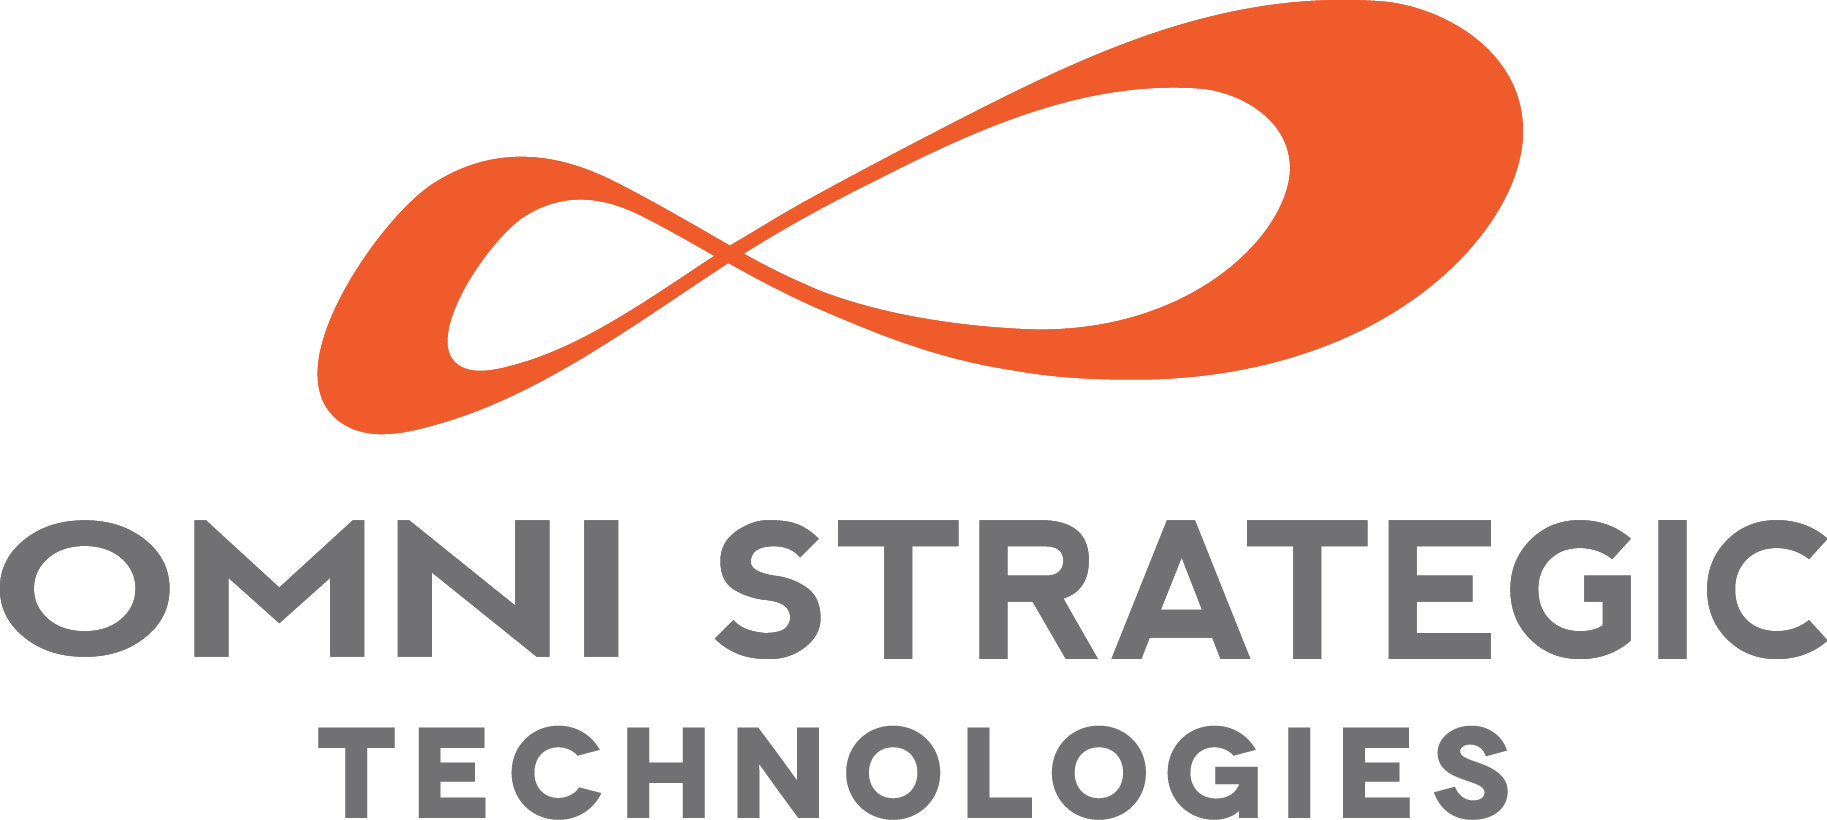 Omni Strategic Technologies, Inc.